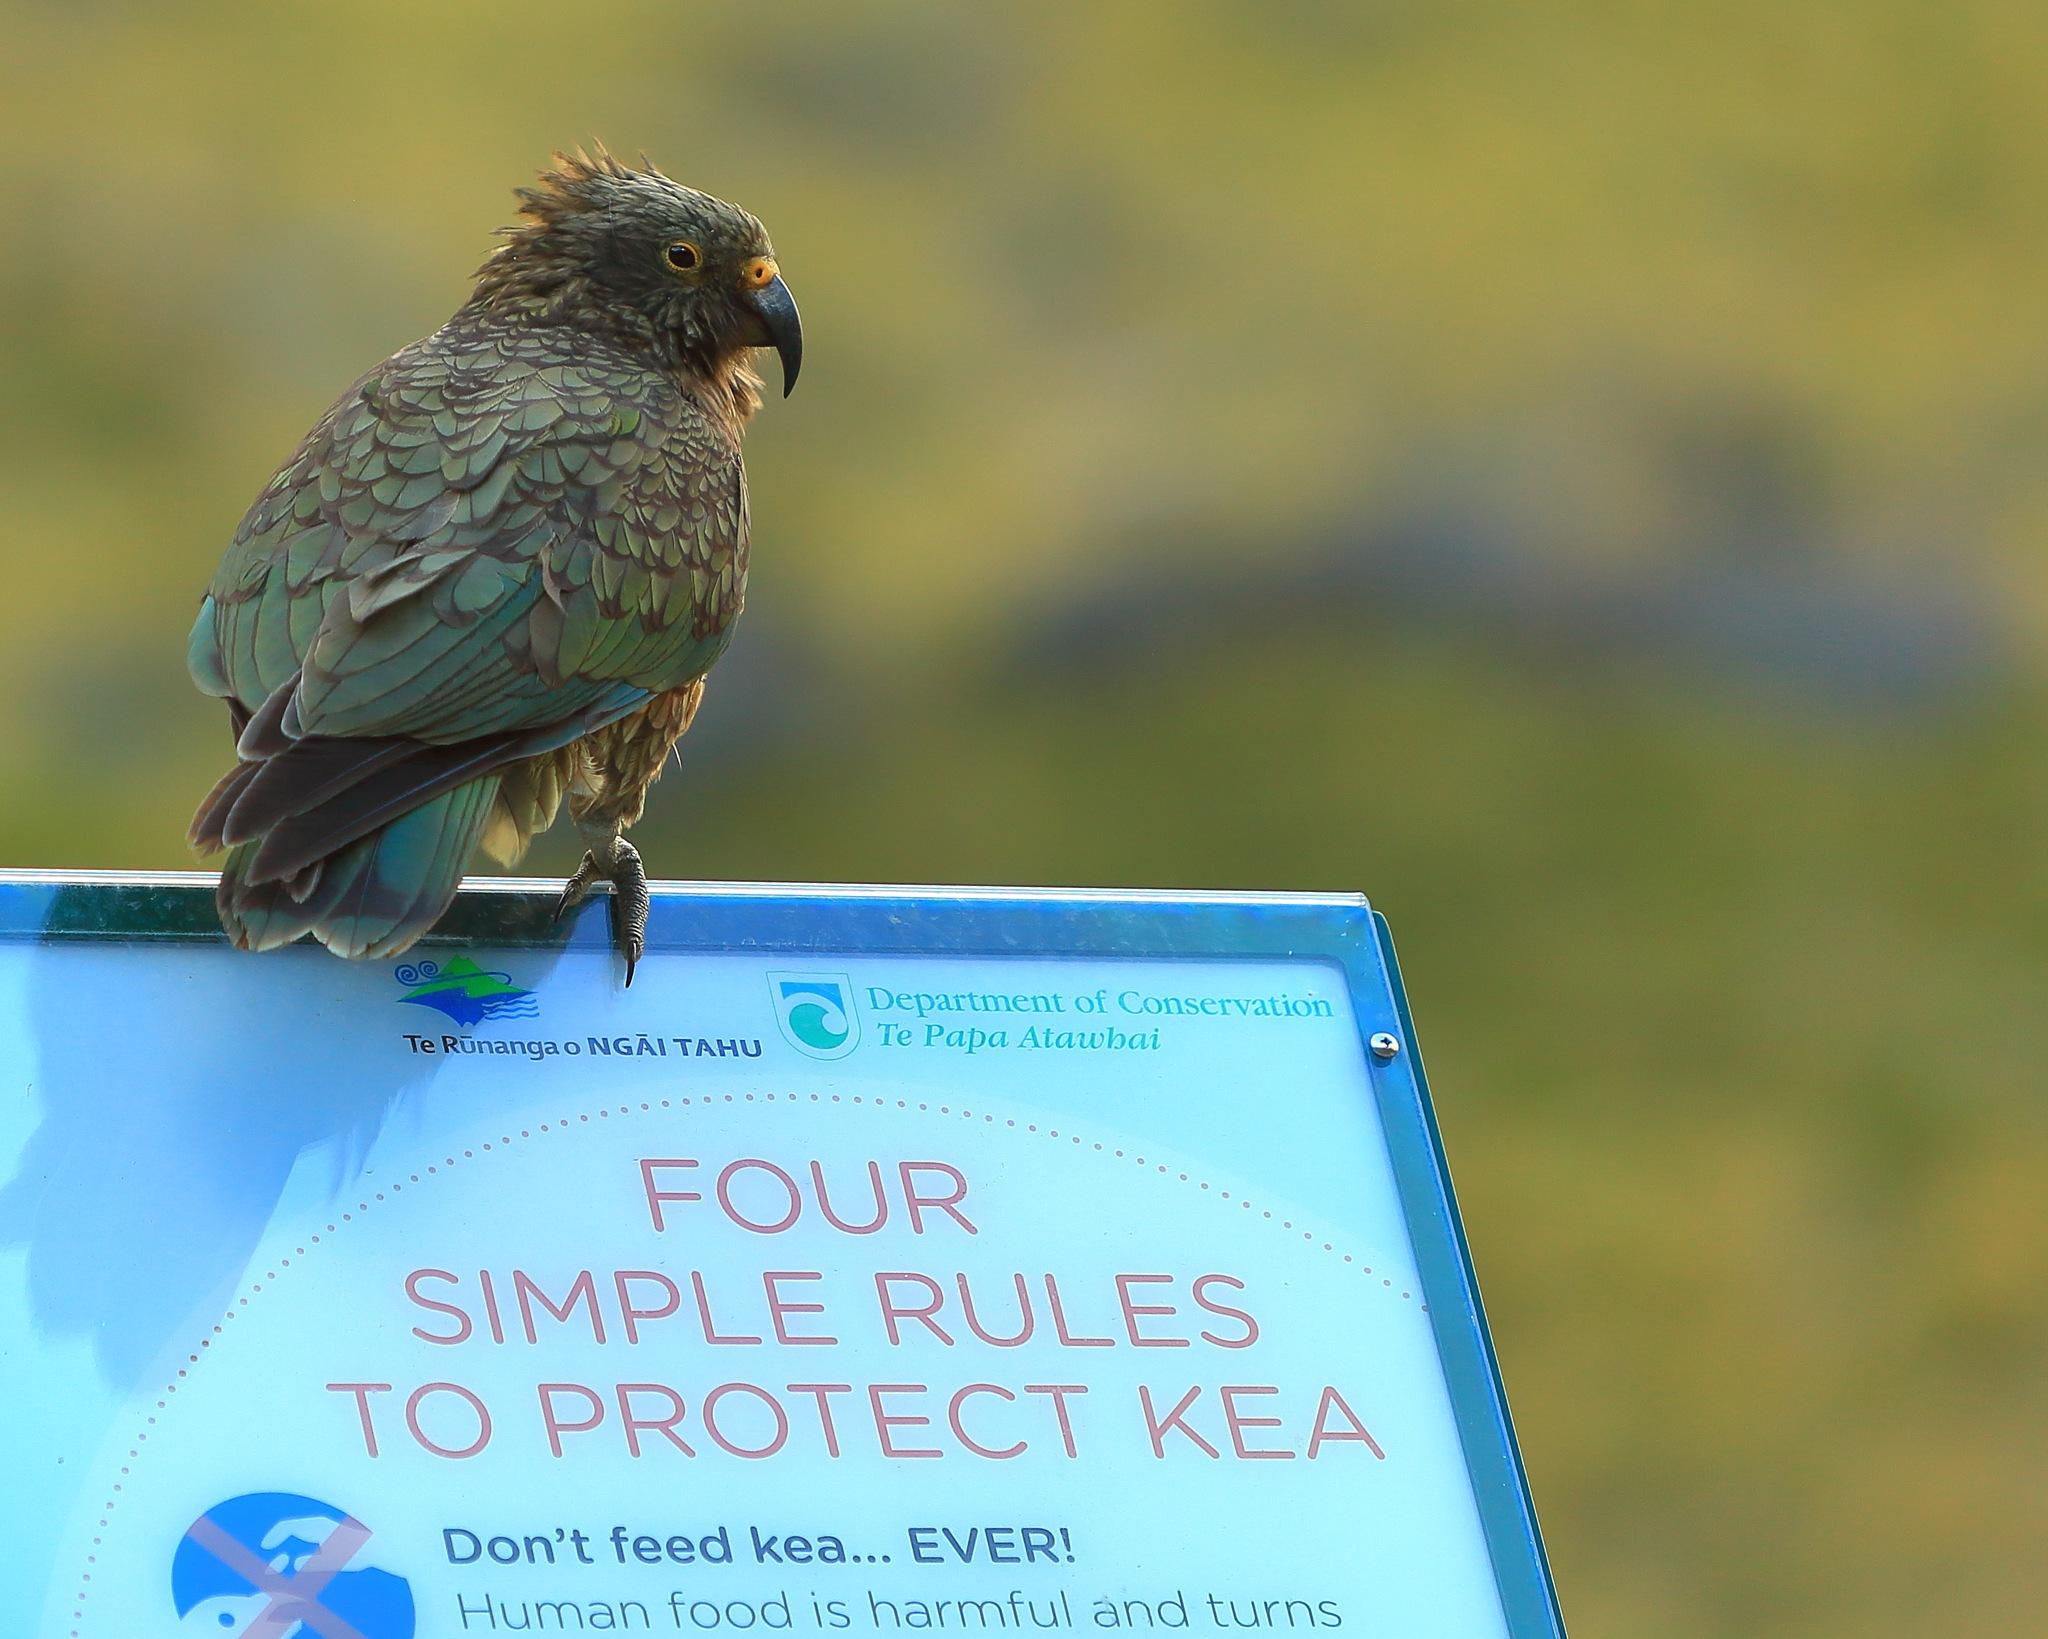 Kea Bird Rules by Kyle Bunting